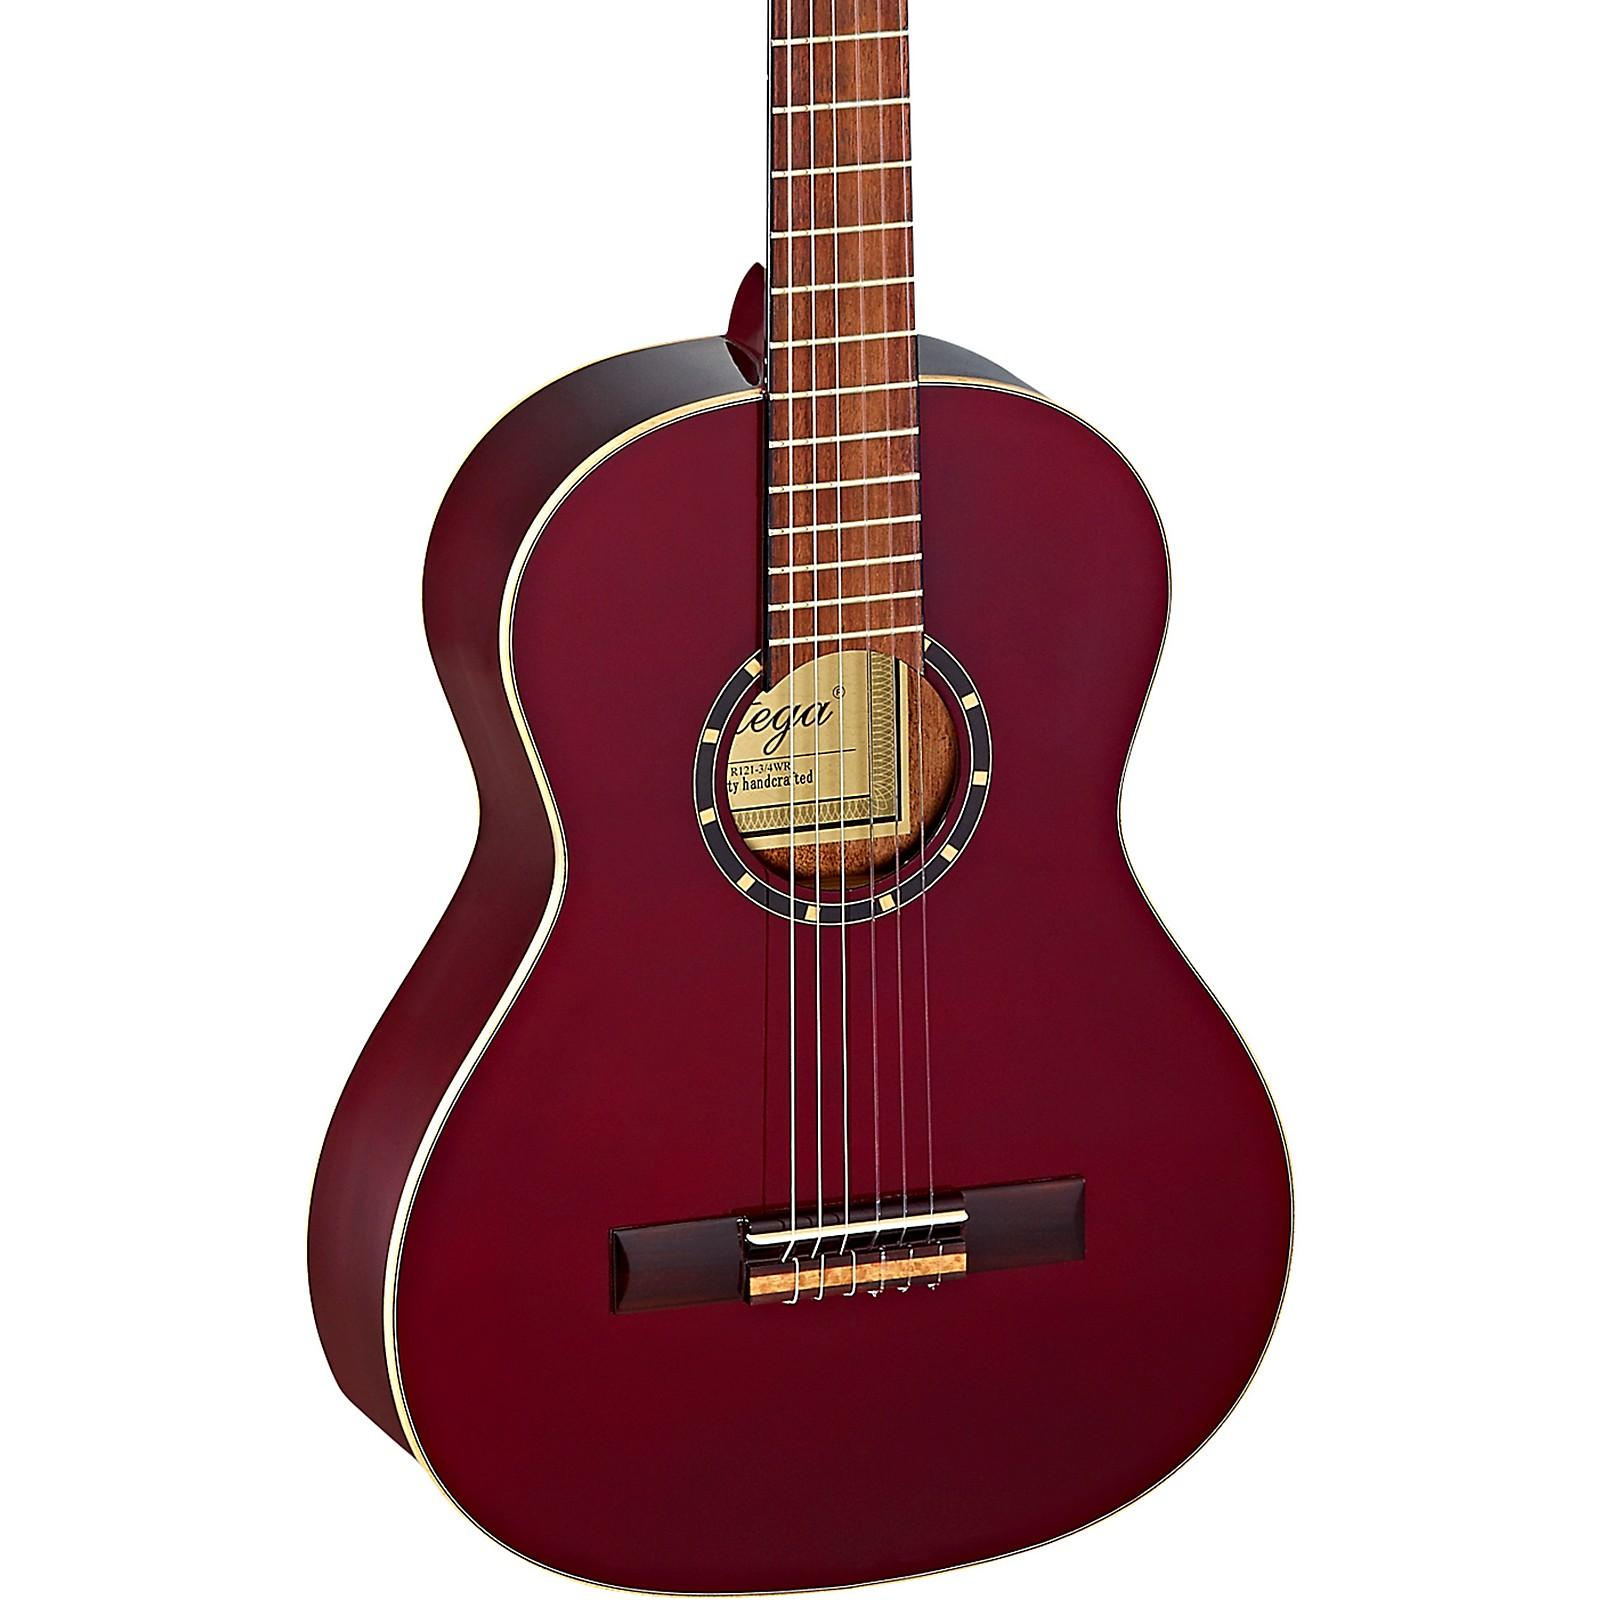 Ortega Family Series R121-3/4WR 3/4 Size Classical Guitar